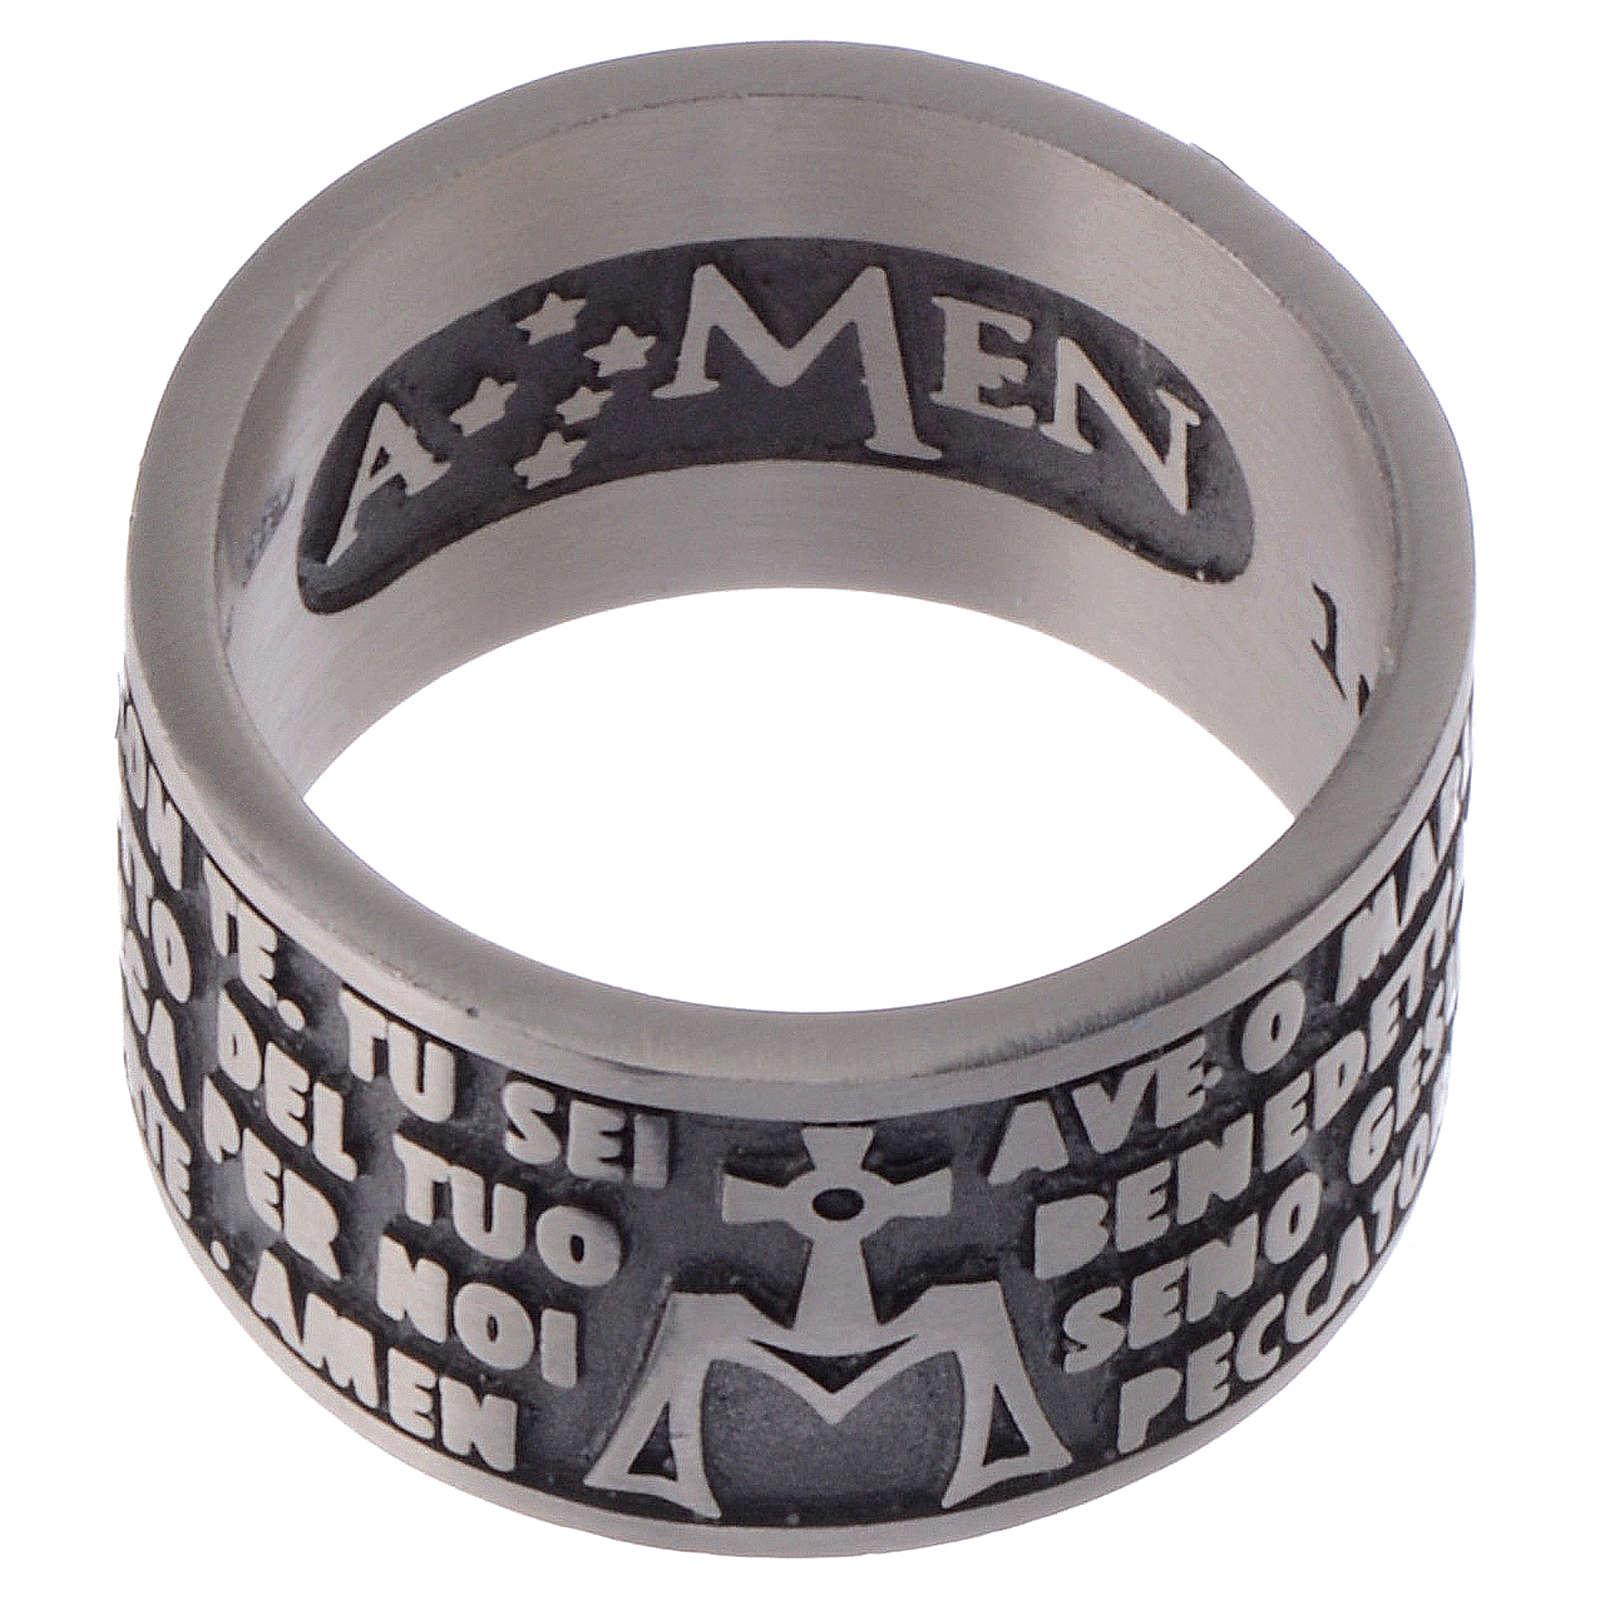 Prayer ring AMEN Hail Mary in Italian 3